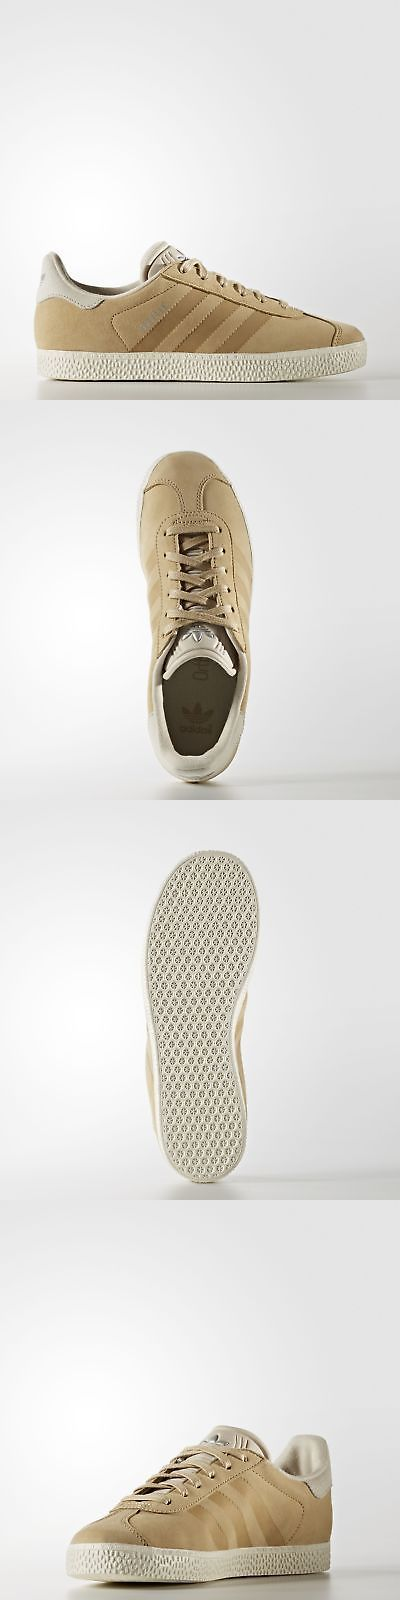 cool adidas shoes for kids ebay adidas gazelle og black on feet